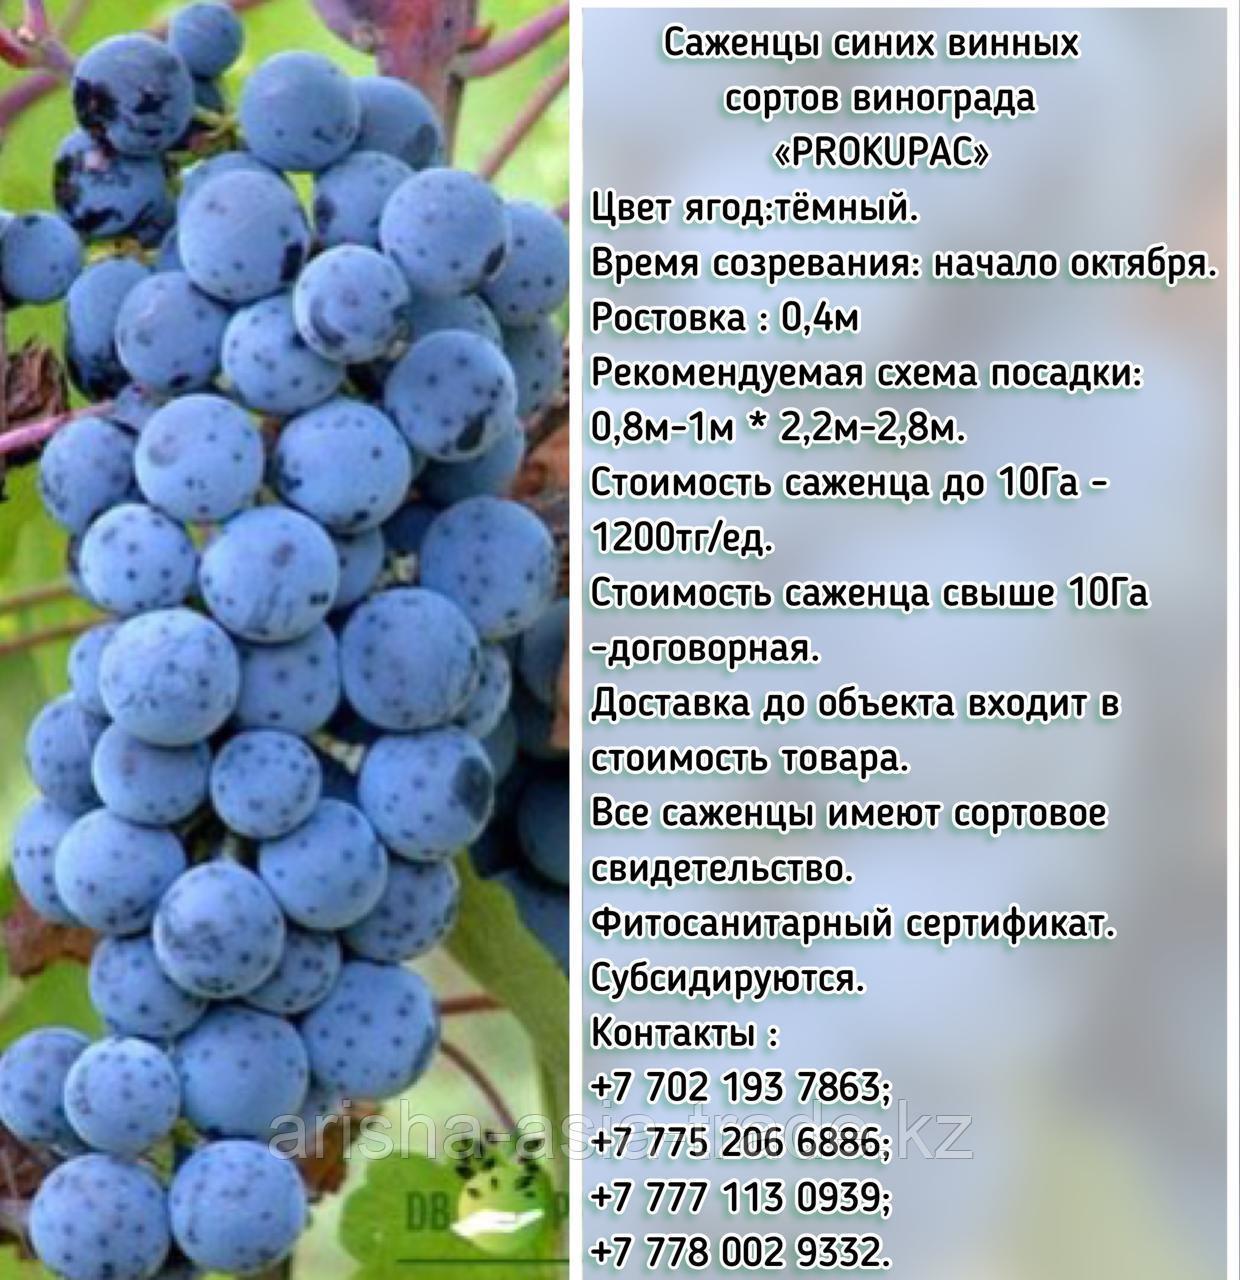 "Саженец винограда синий винный ""Prokupac"" (Прокупац) Сербия"